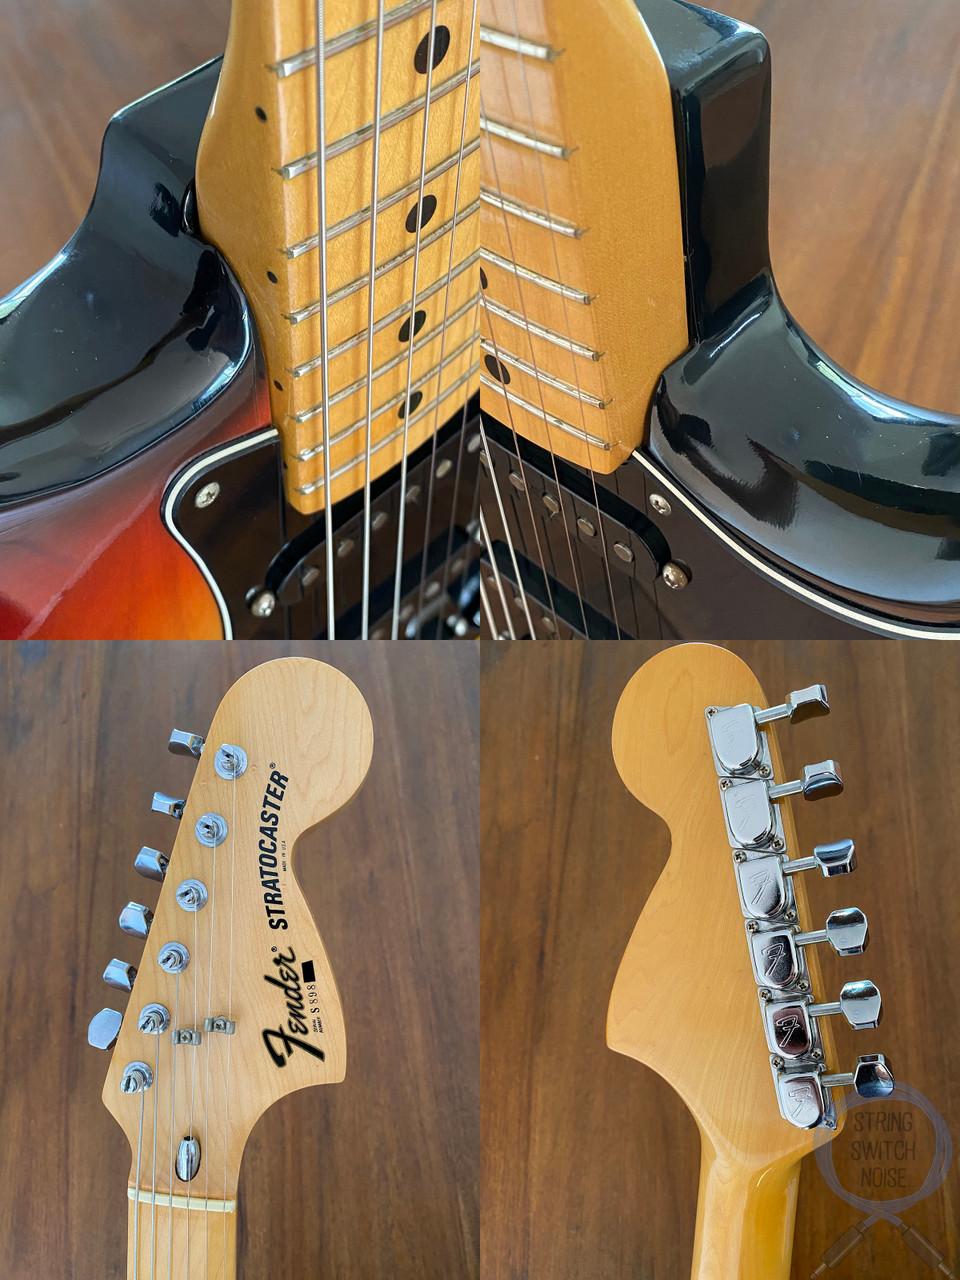 Fender Stratocaster, Sunburst, USA, 1977, OHSC, NEAR MINT